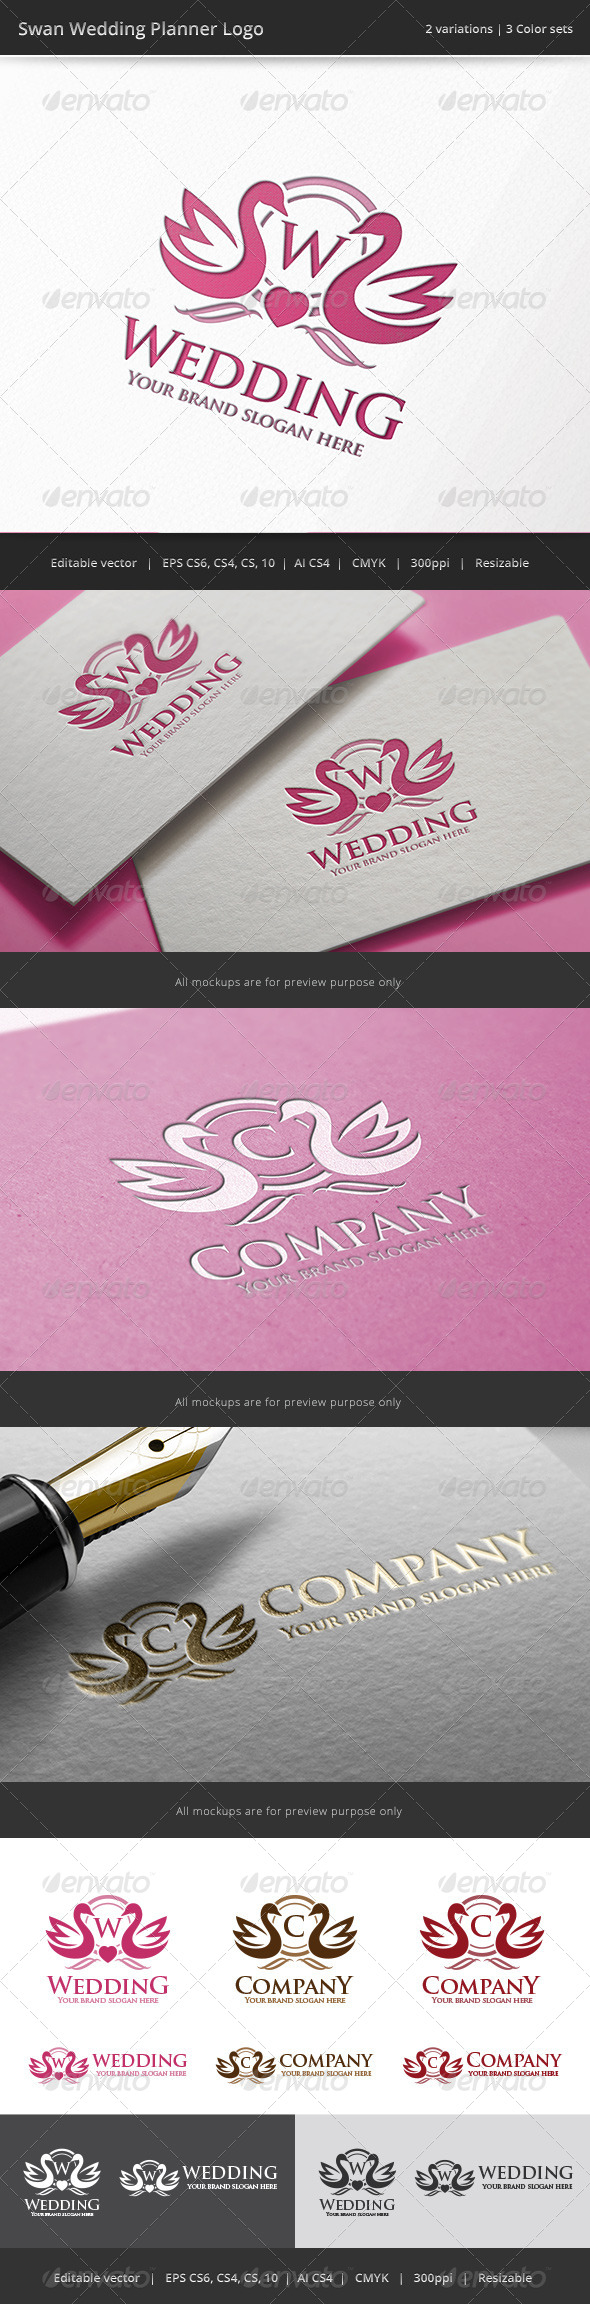 GraphicRiver Swan Wedding Letter Crest Logo 8003143